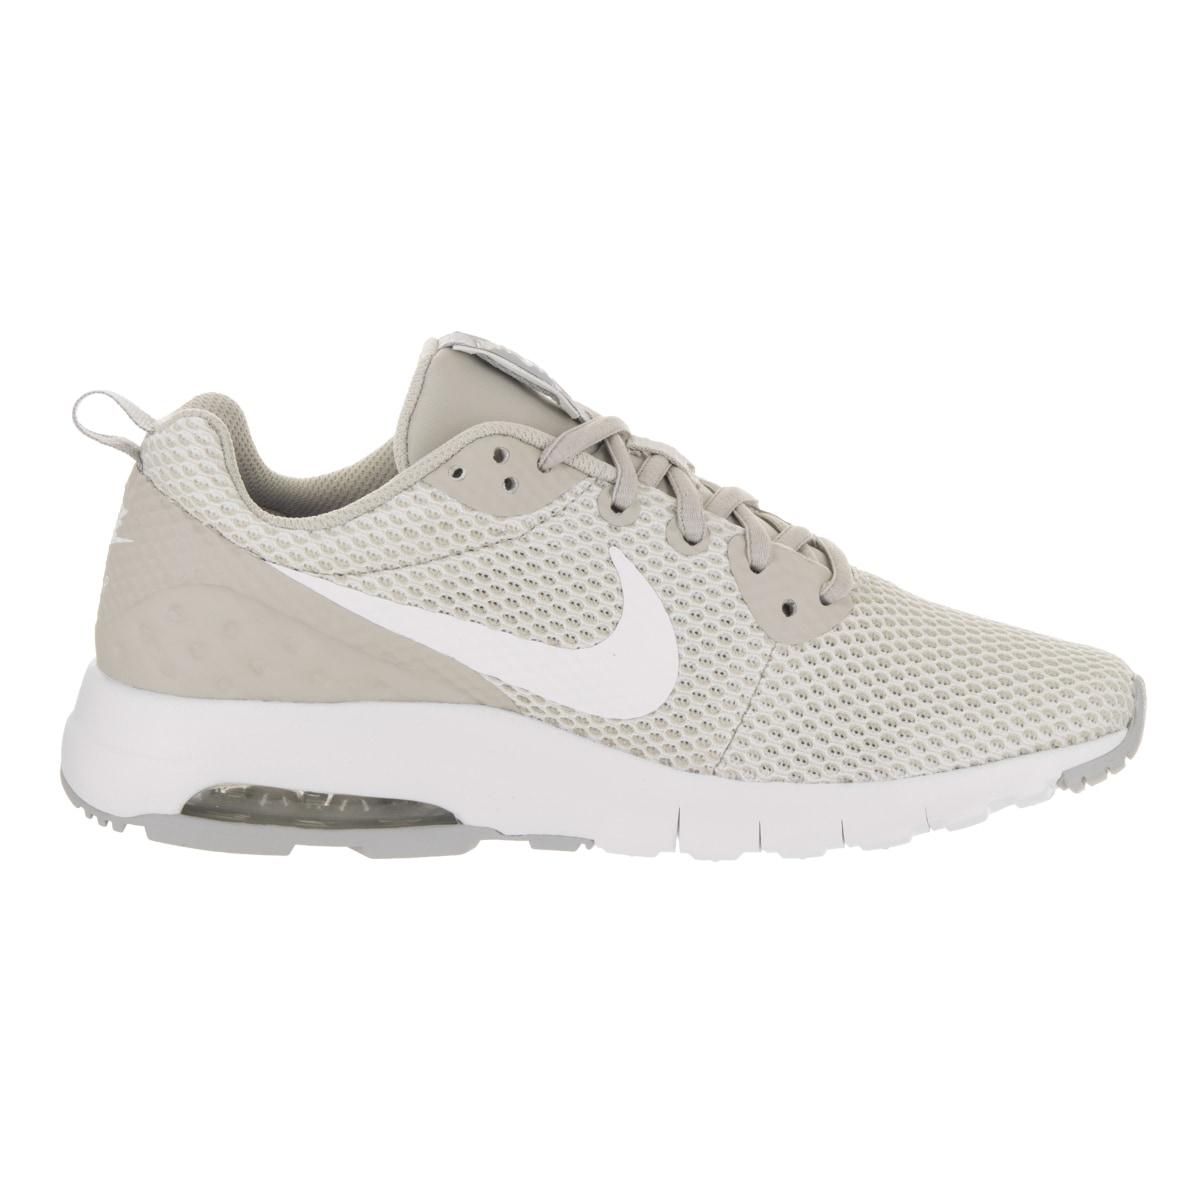 size 40 5cdc6 29463 ... low price comprar nike comprar air max motion lw se para 363 para mujer  zapatillas sin